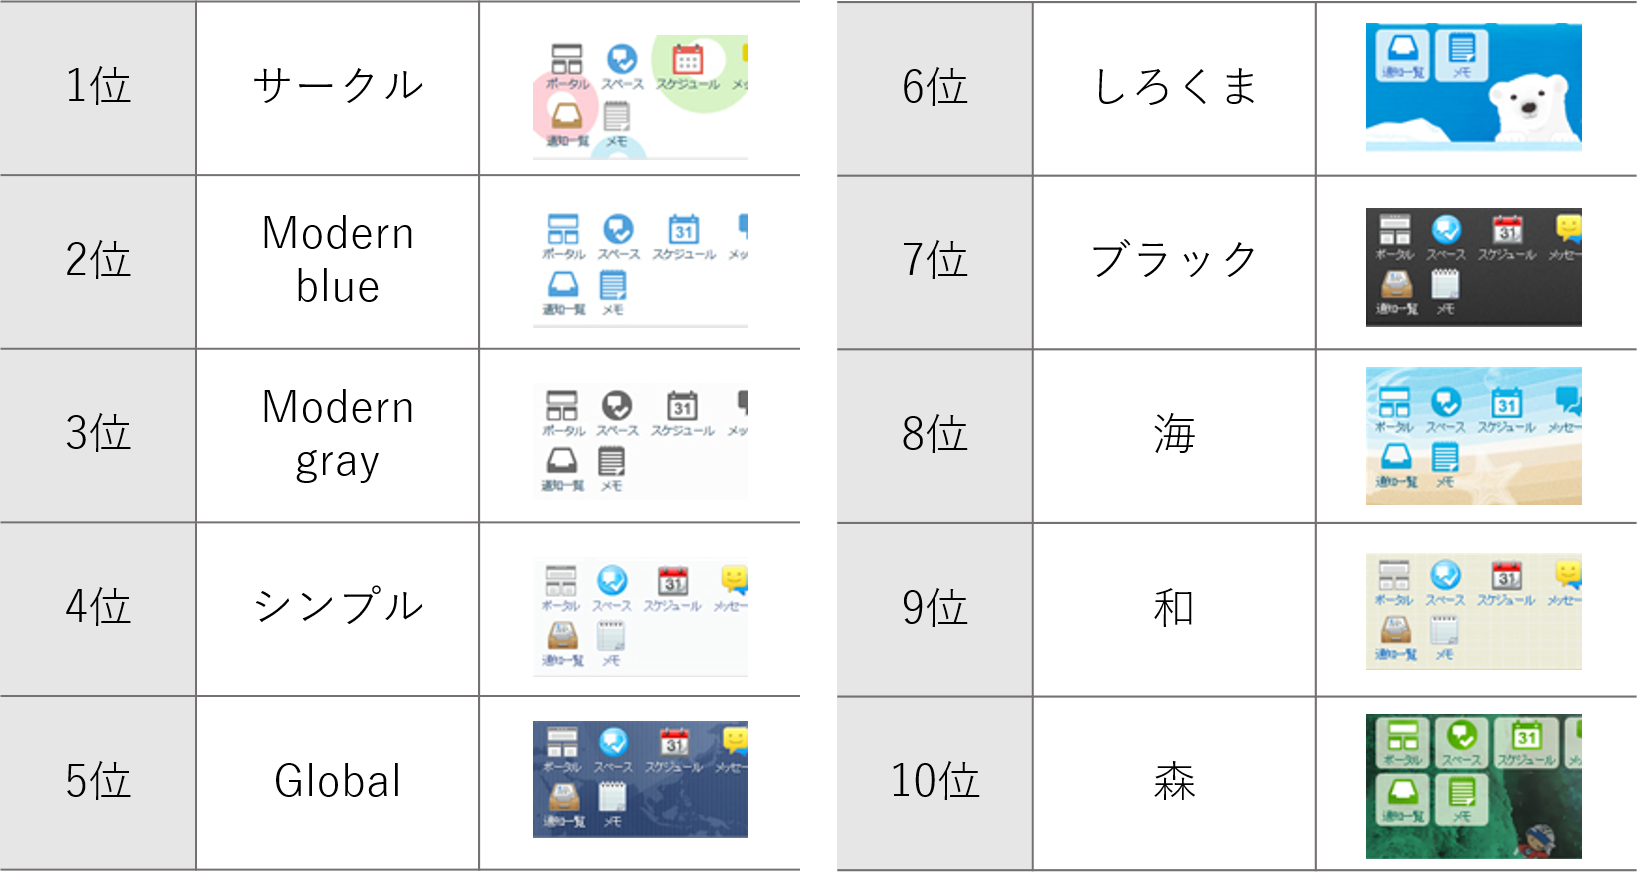 https://enterprise.cybozu.co.jp/55bcbaf65de58bfeb649d8b2b3665d8e94096f03.png